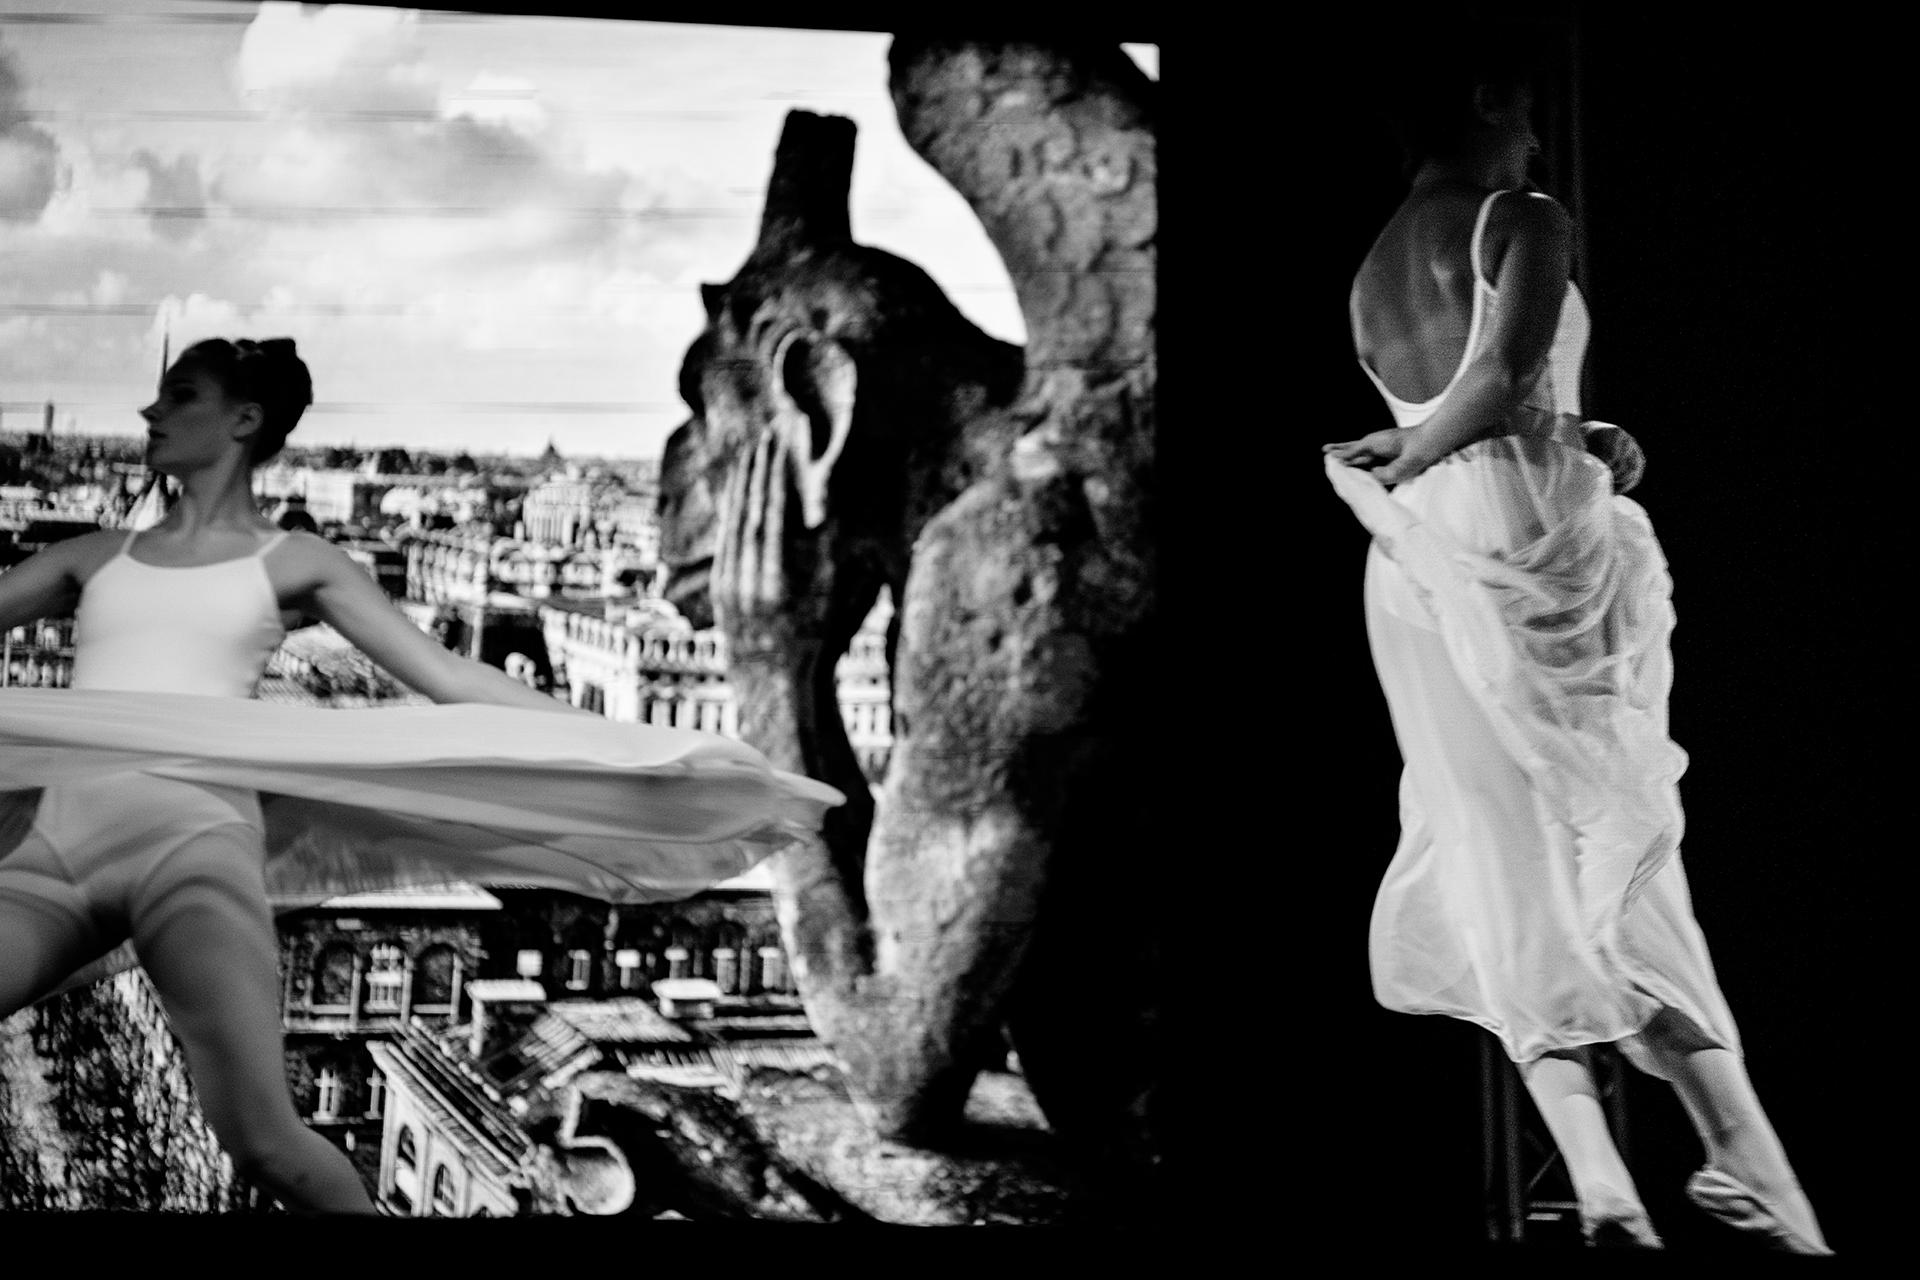 Ballett-by-SilvanGiger-11.jpg